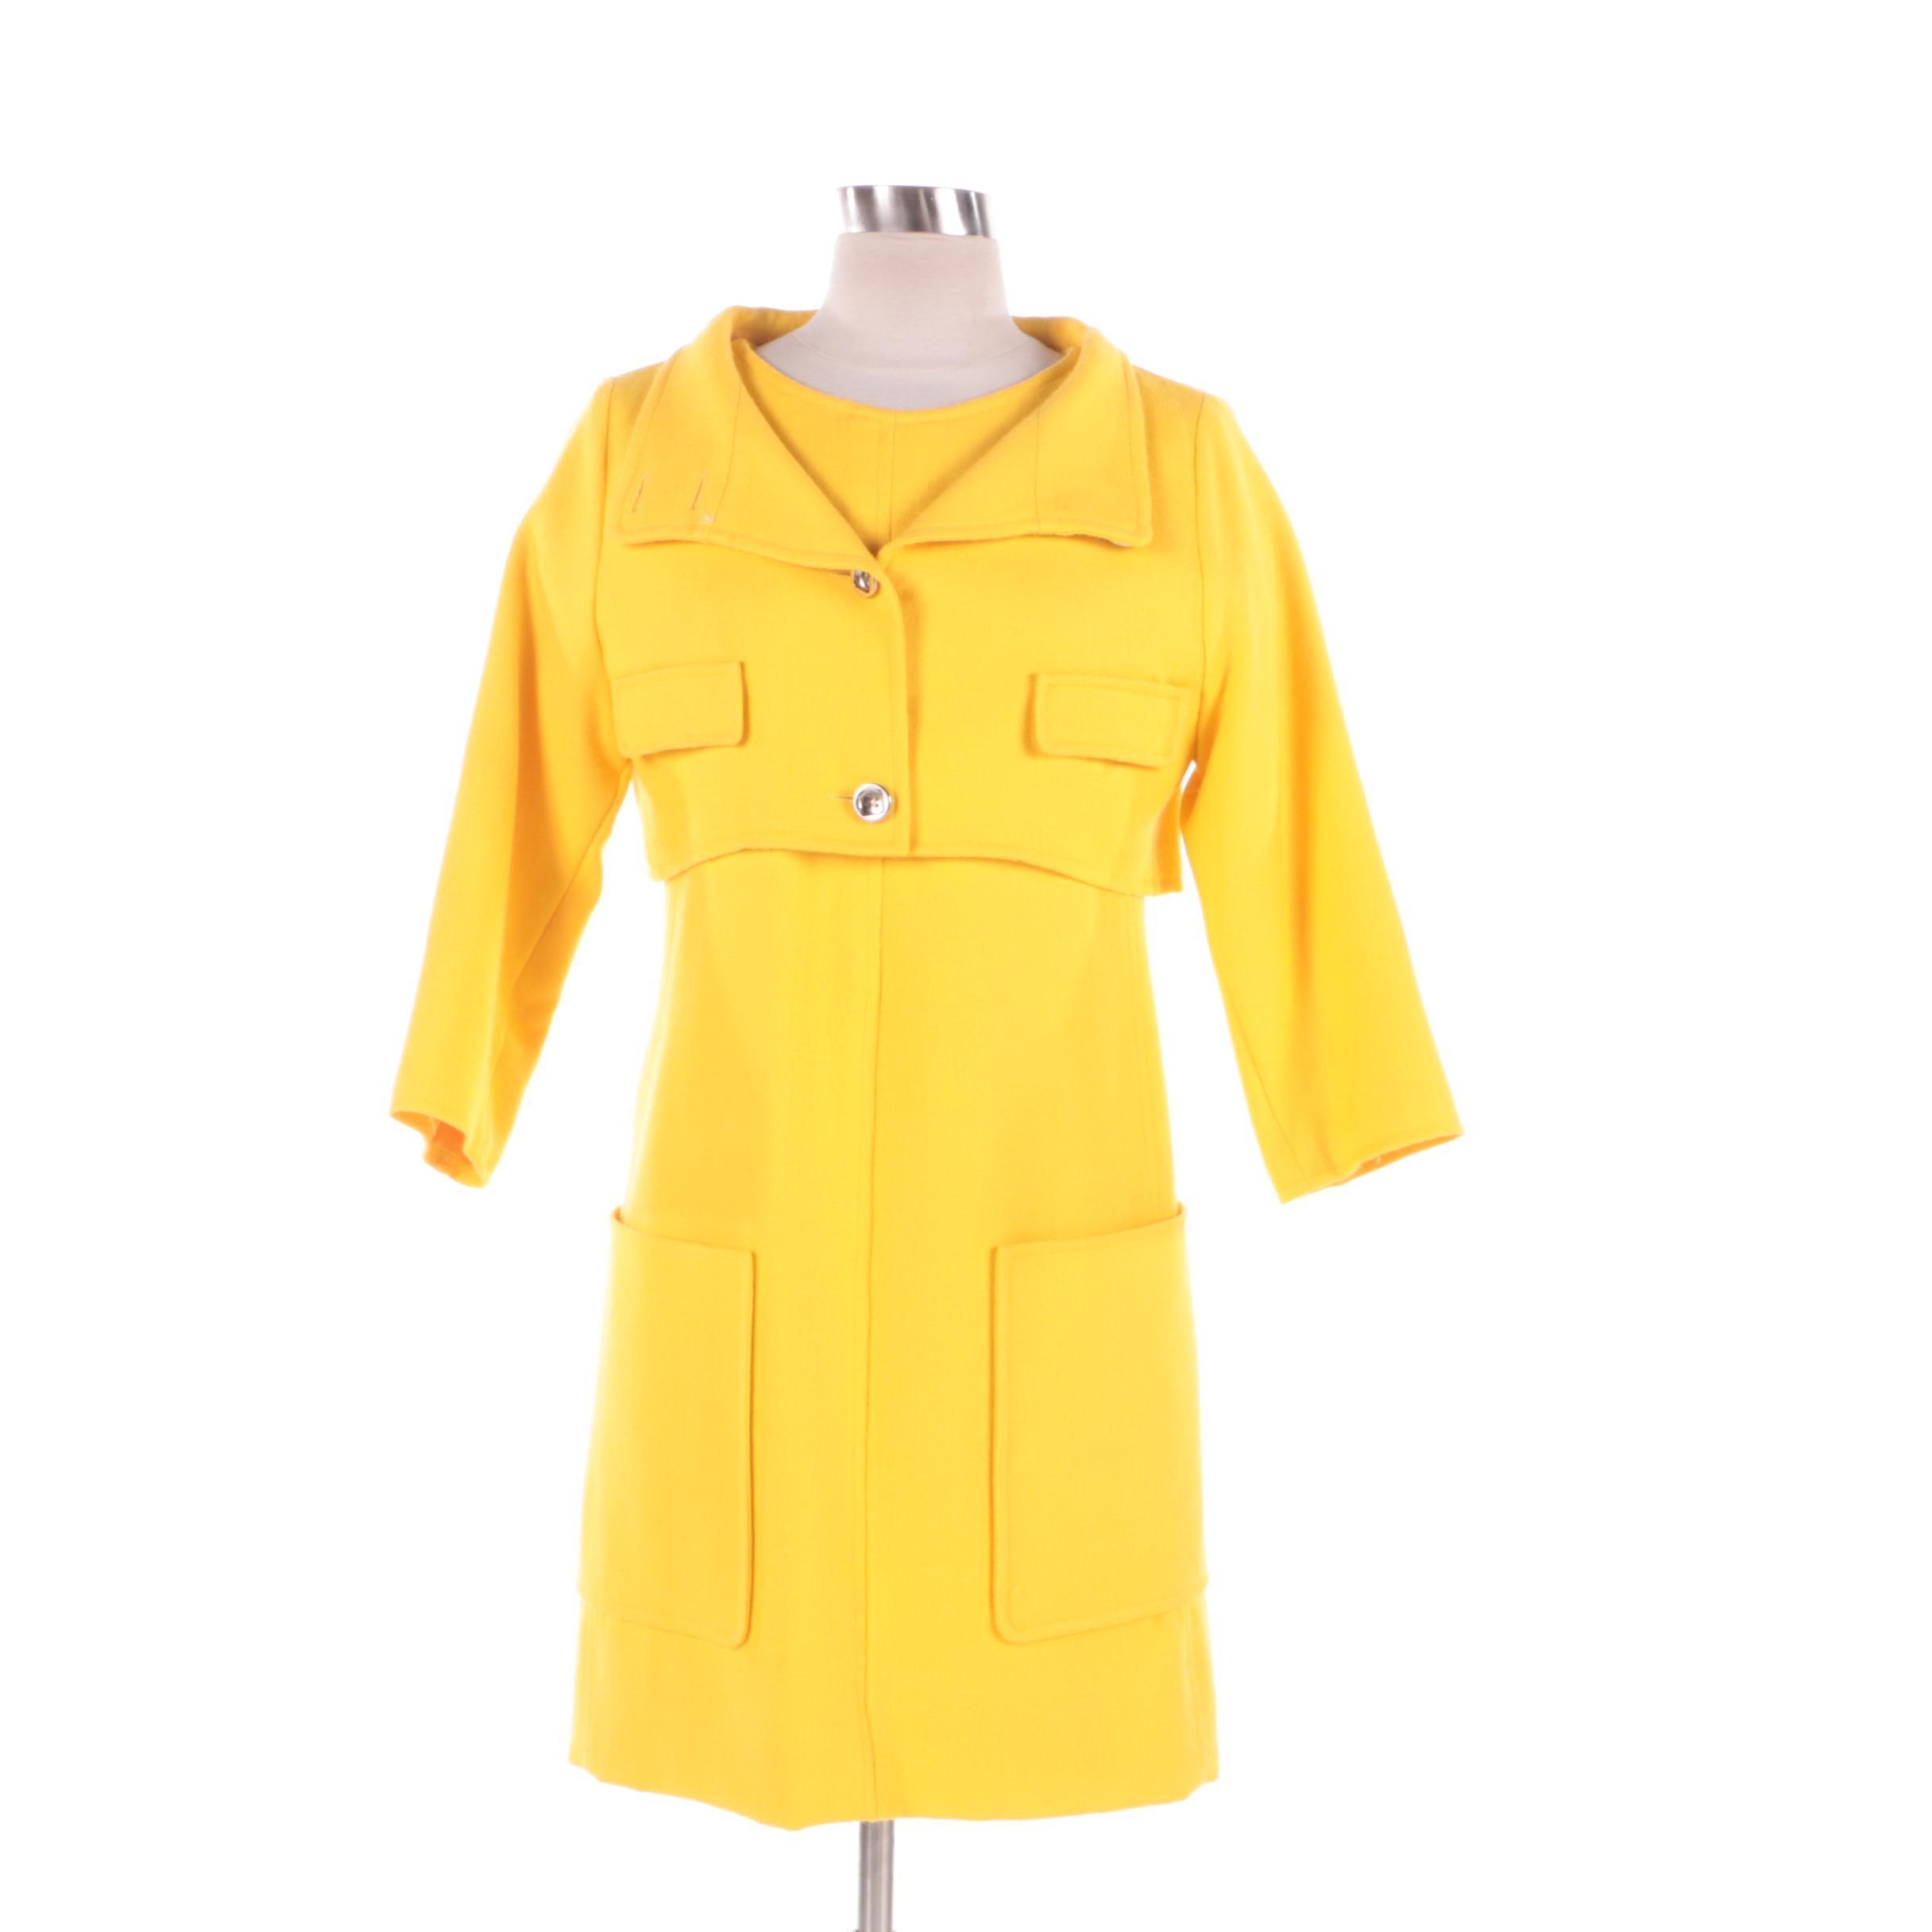 1980s Vintage Courreges of Paris Yellow Dress and Cropped Jacket Ensemble